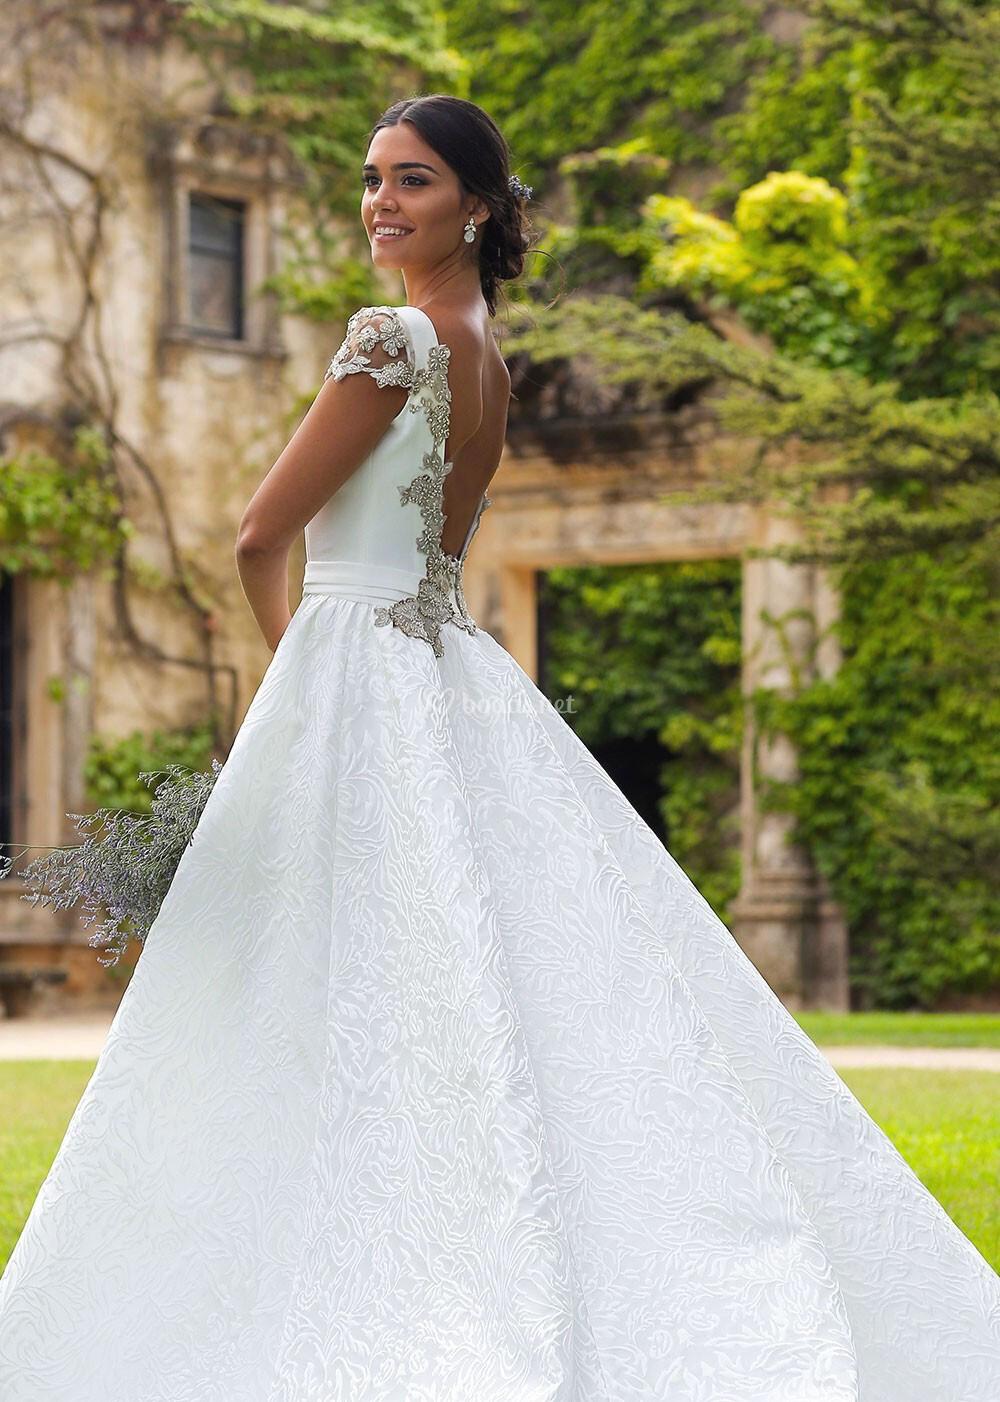 85073385e Vestidos novia silvia navarro precios – Vestidos de mujer